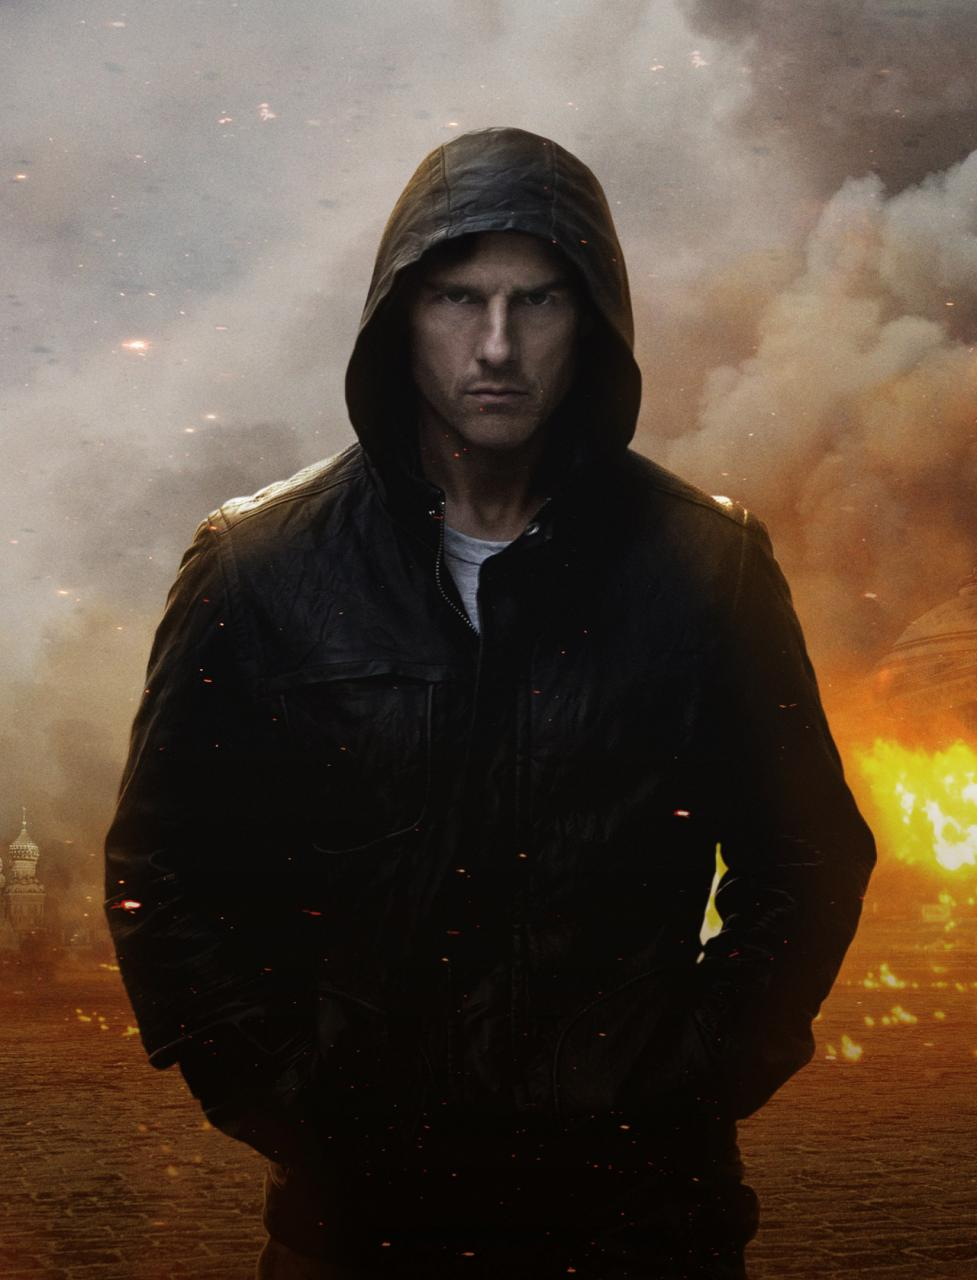 Mission Impossible Ghost Protocol 4 - blackfilm.com/read ...